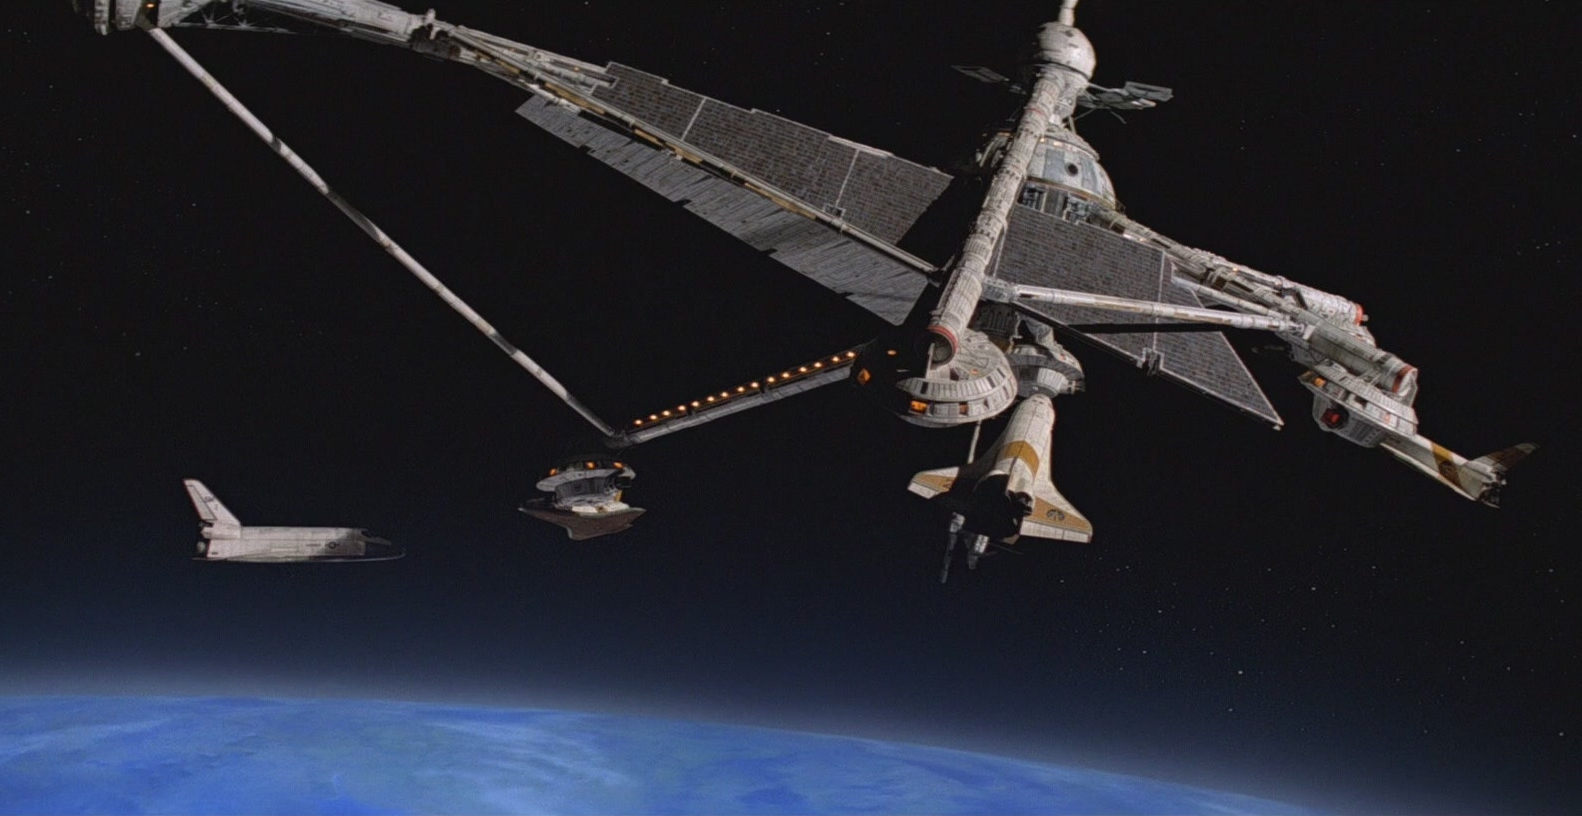 Moonraker , 1979, film still showing Hugo Drax's space station, dir. Lewis Gilbert.